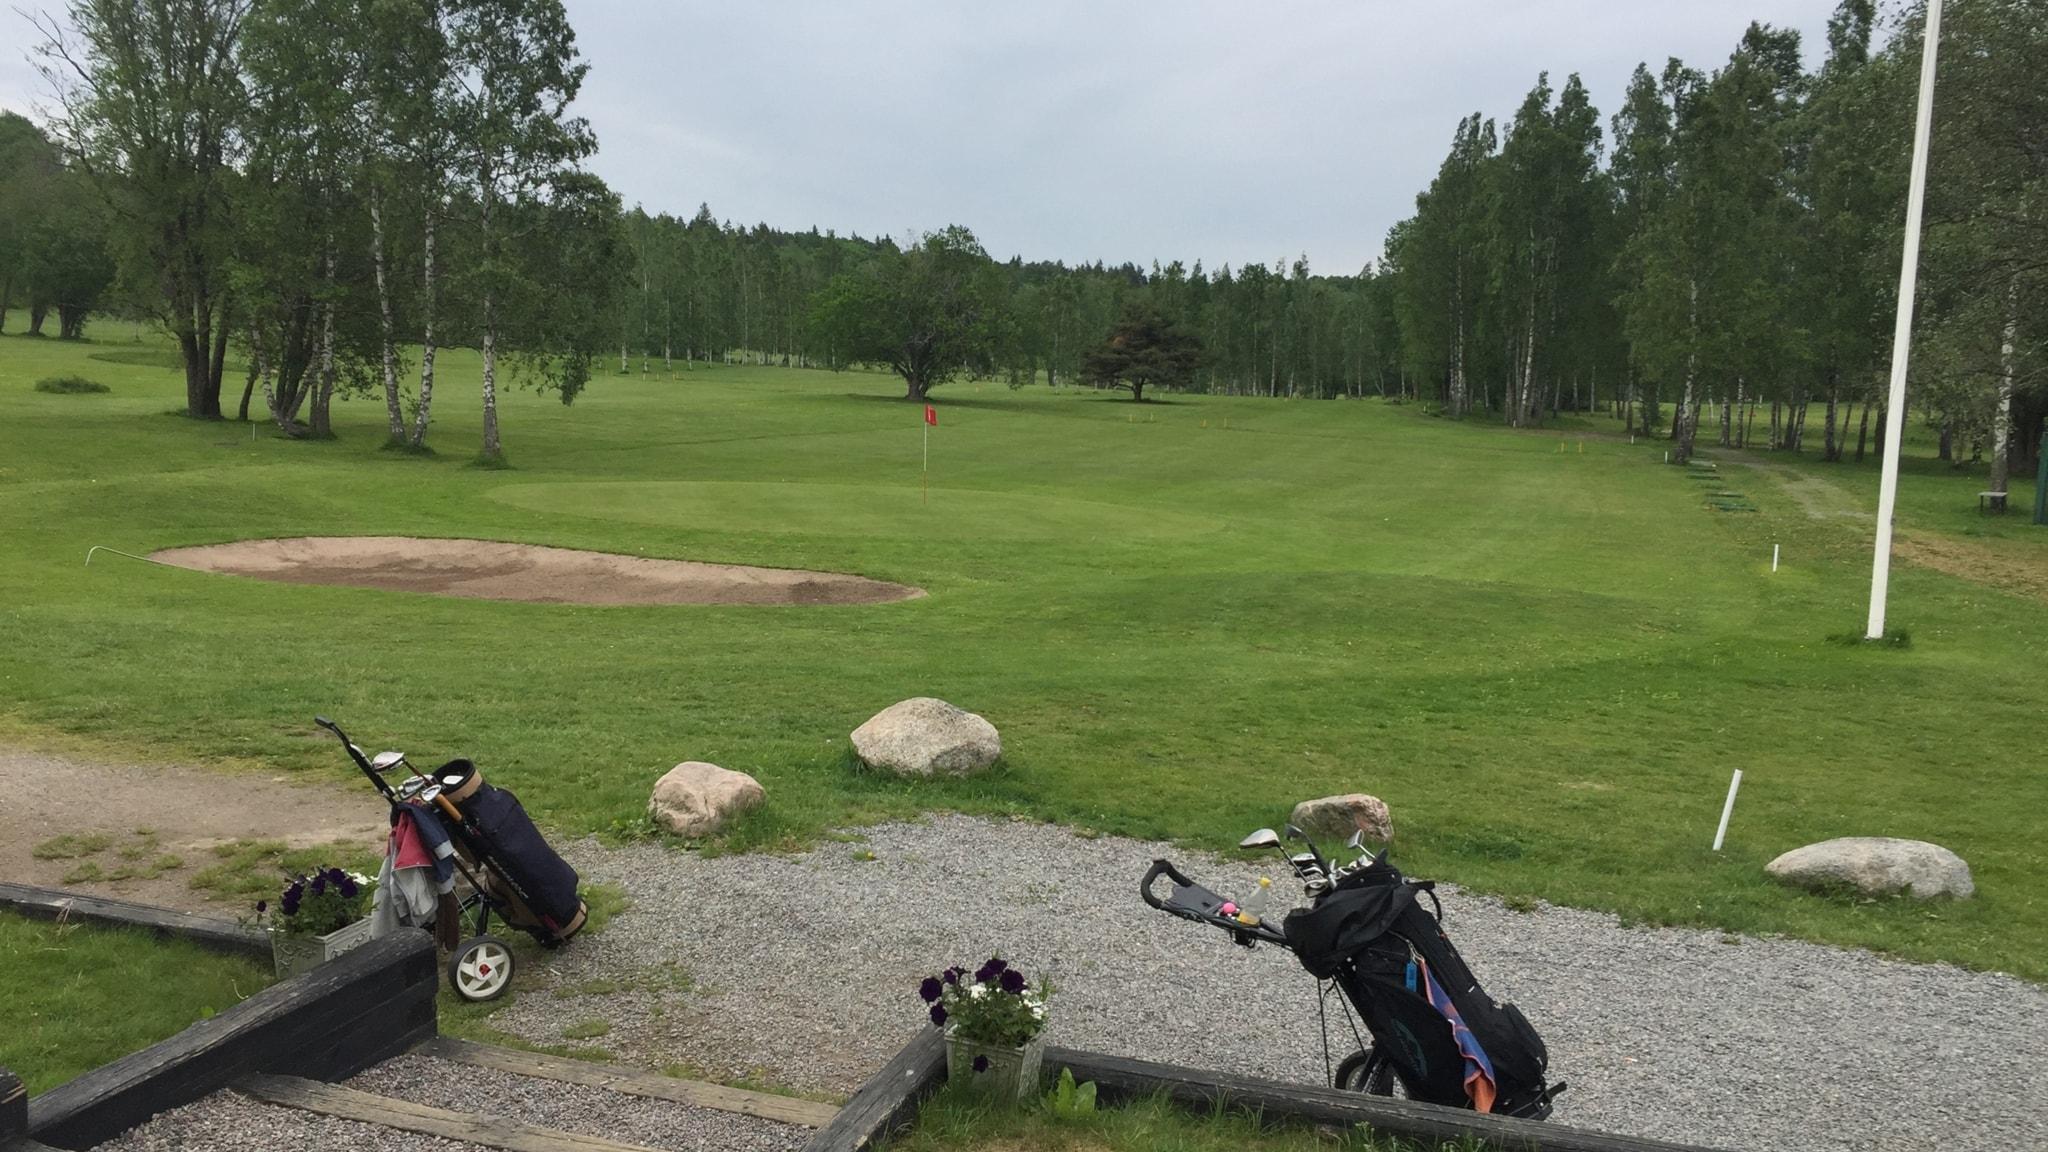 Nionde hålet på Danderyds golfklubbs bana.